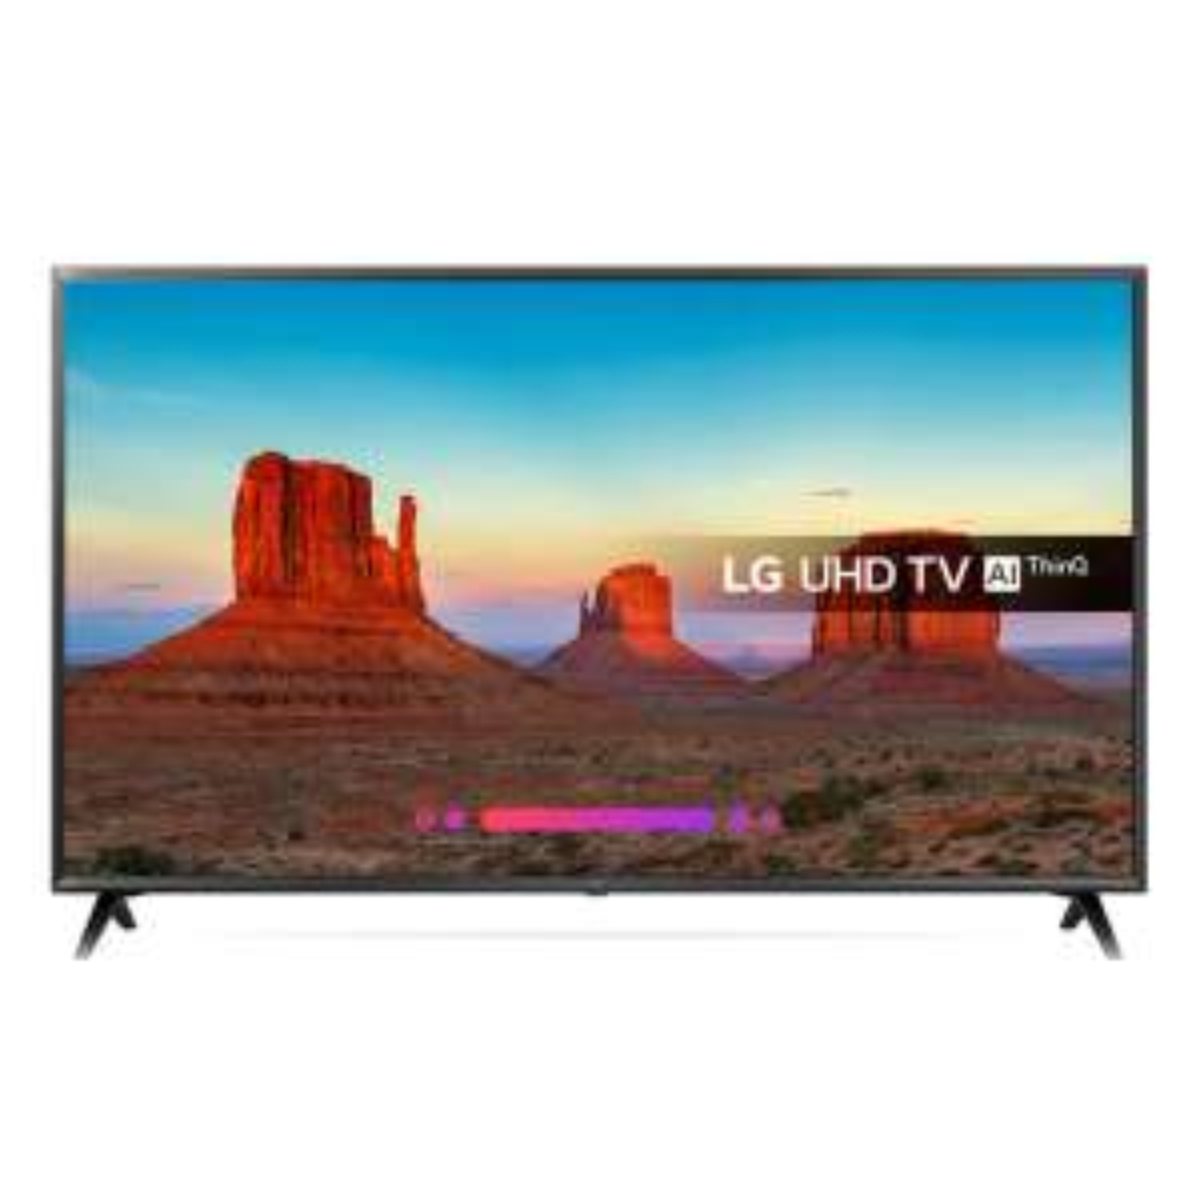 LG 65UK6300PLB 65 Inch Ultra HD, 4K HDR, Freeview Play, Smart, LED TV - Black - £479 @ PRC Direct